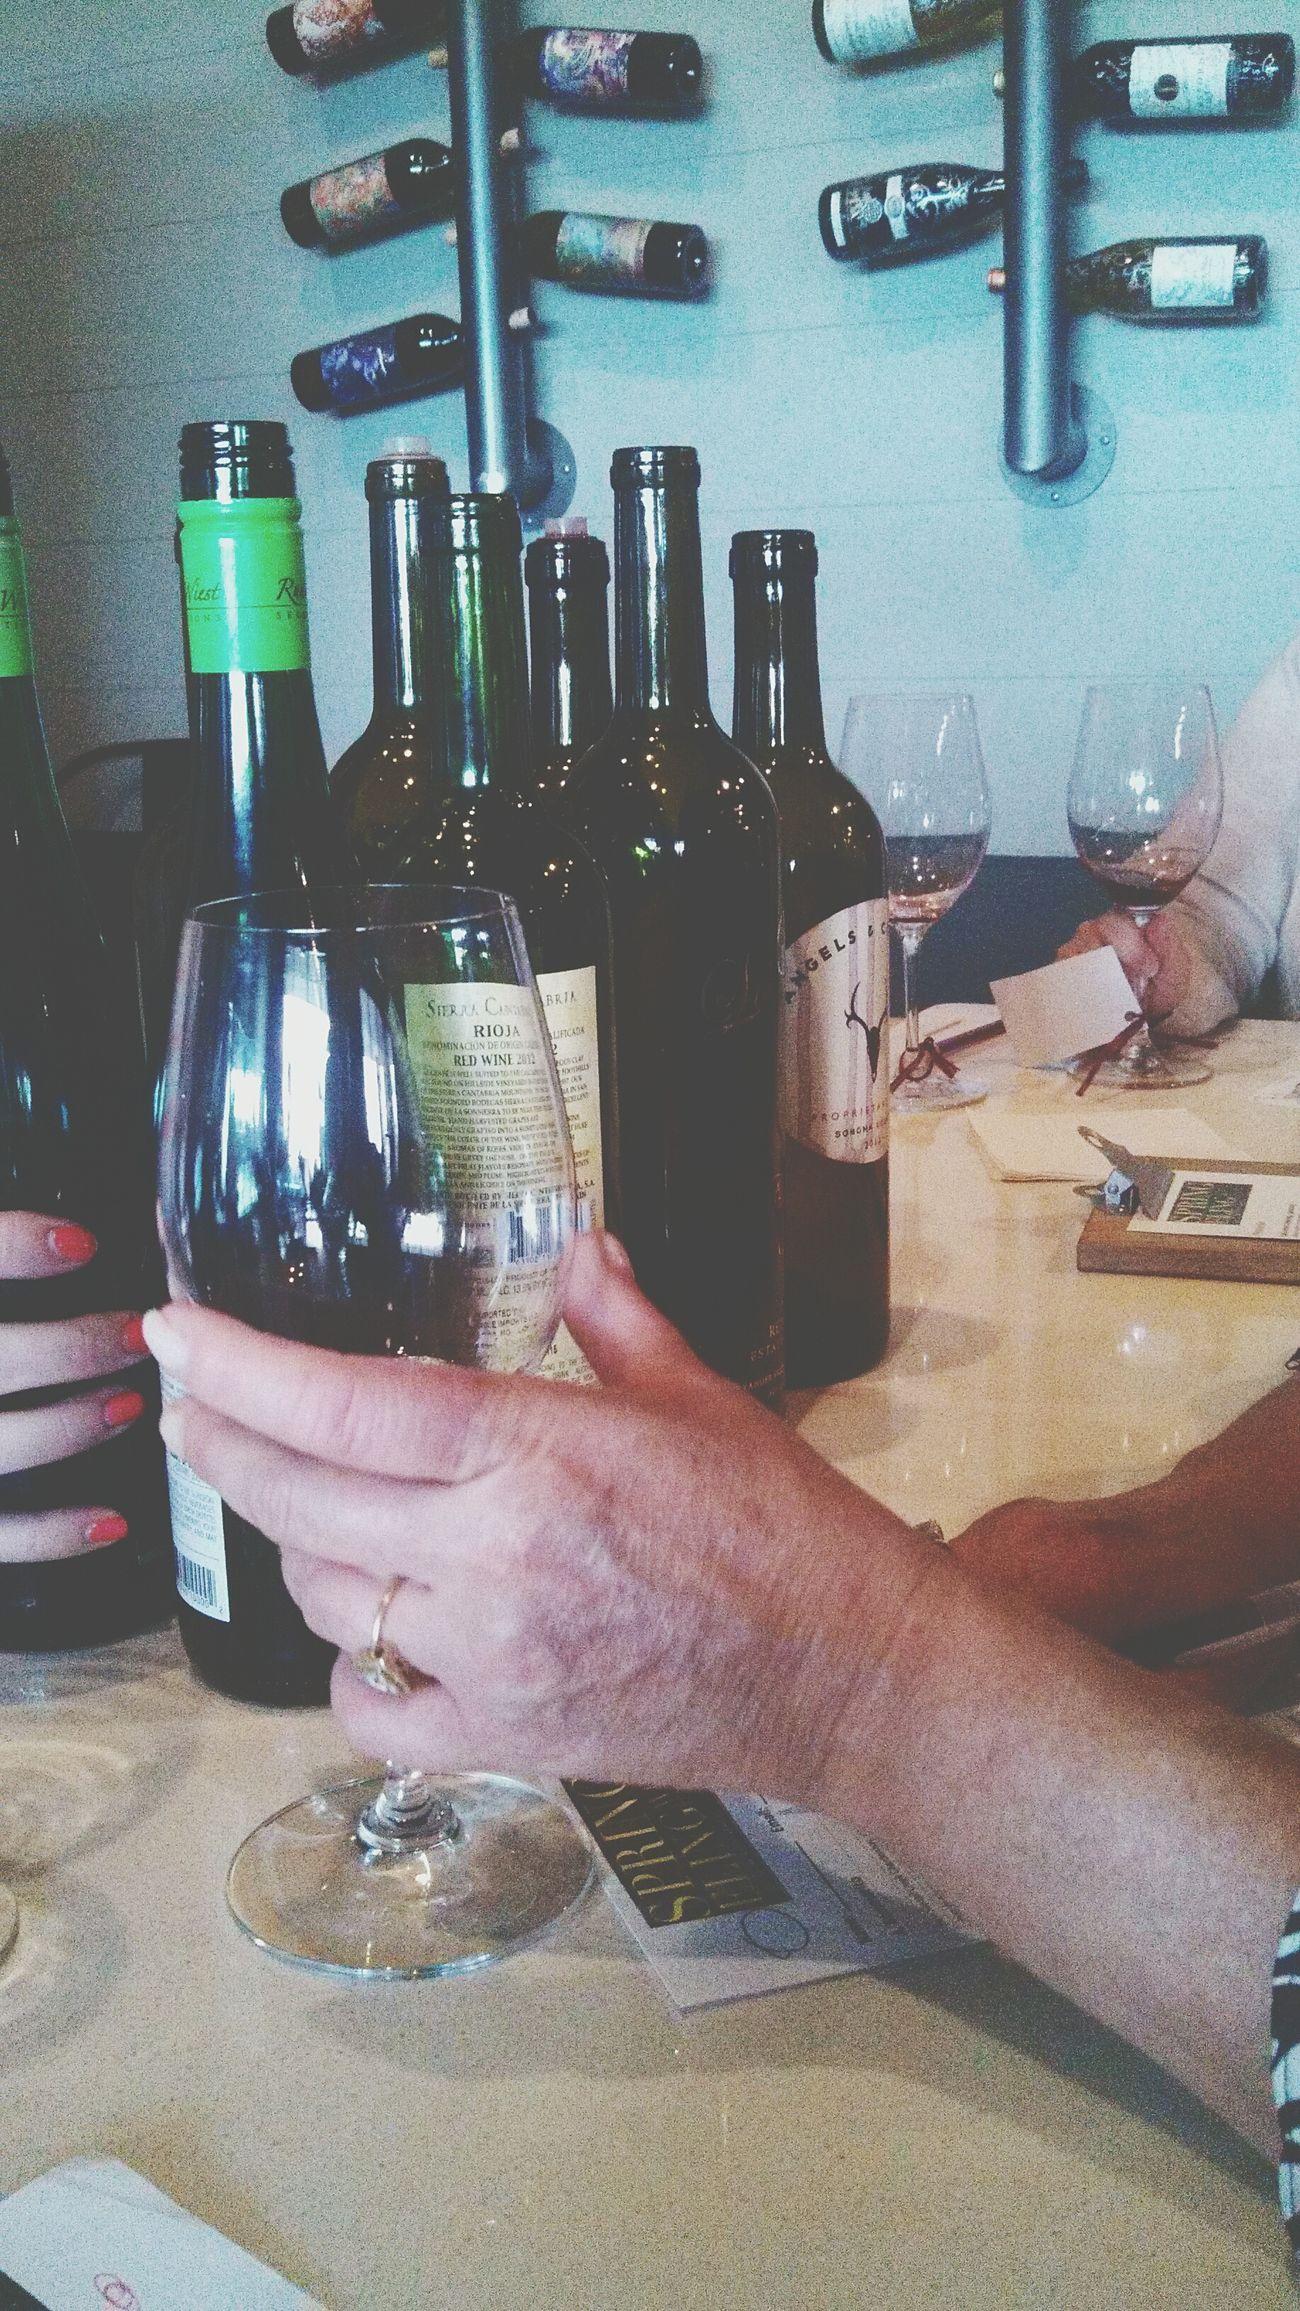 Wine Winetasting Winetime Wineglass Winebotttle Winebottles OpenEdit